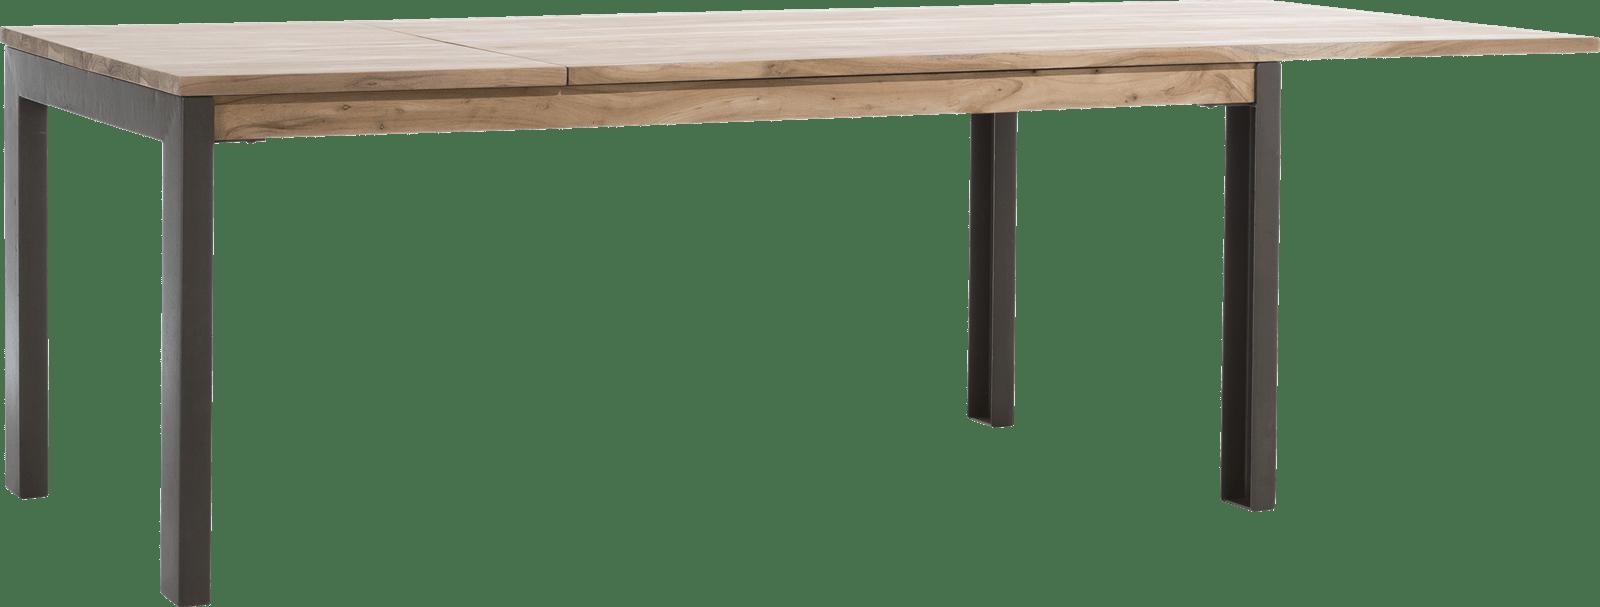 Falster - table a rallonge 190 (+ 60) x 100 cm